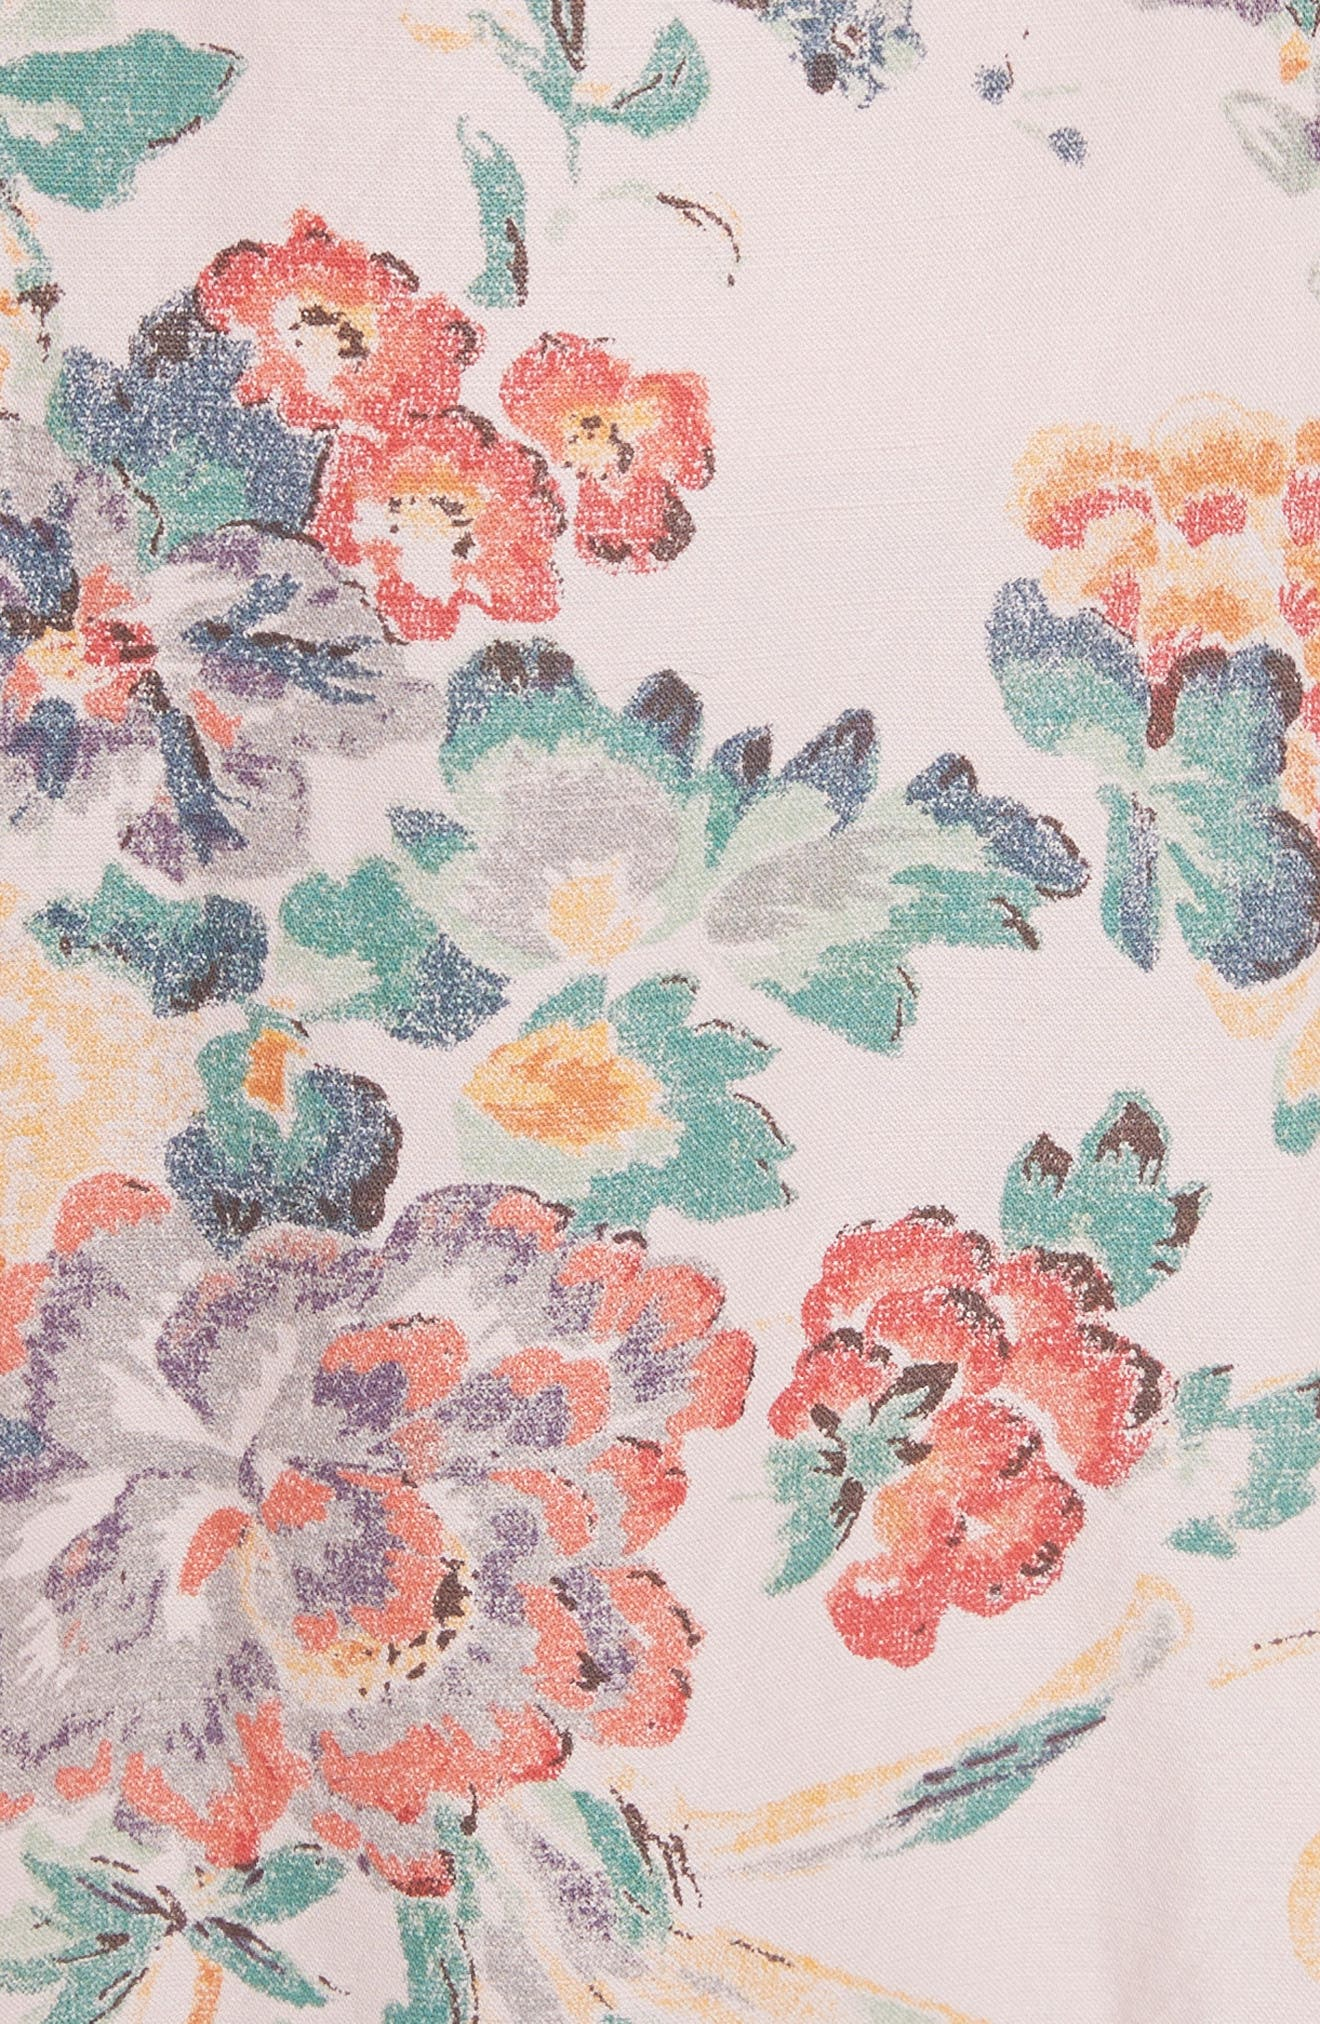 Marlena Ruffled Floral Skirt,                             Alternate thumbnail 5, color,                             Dusty Rose Combo